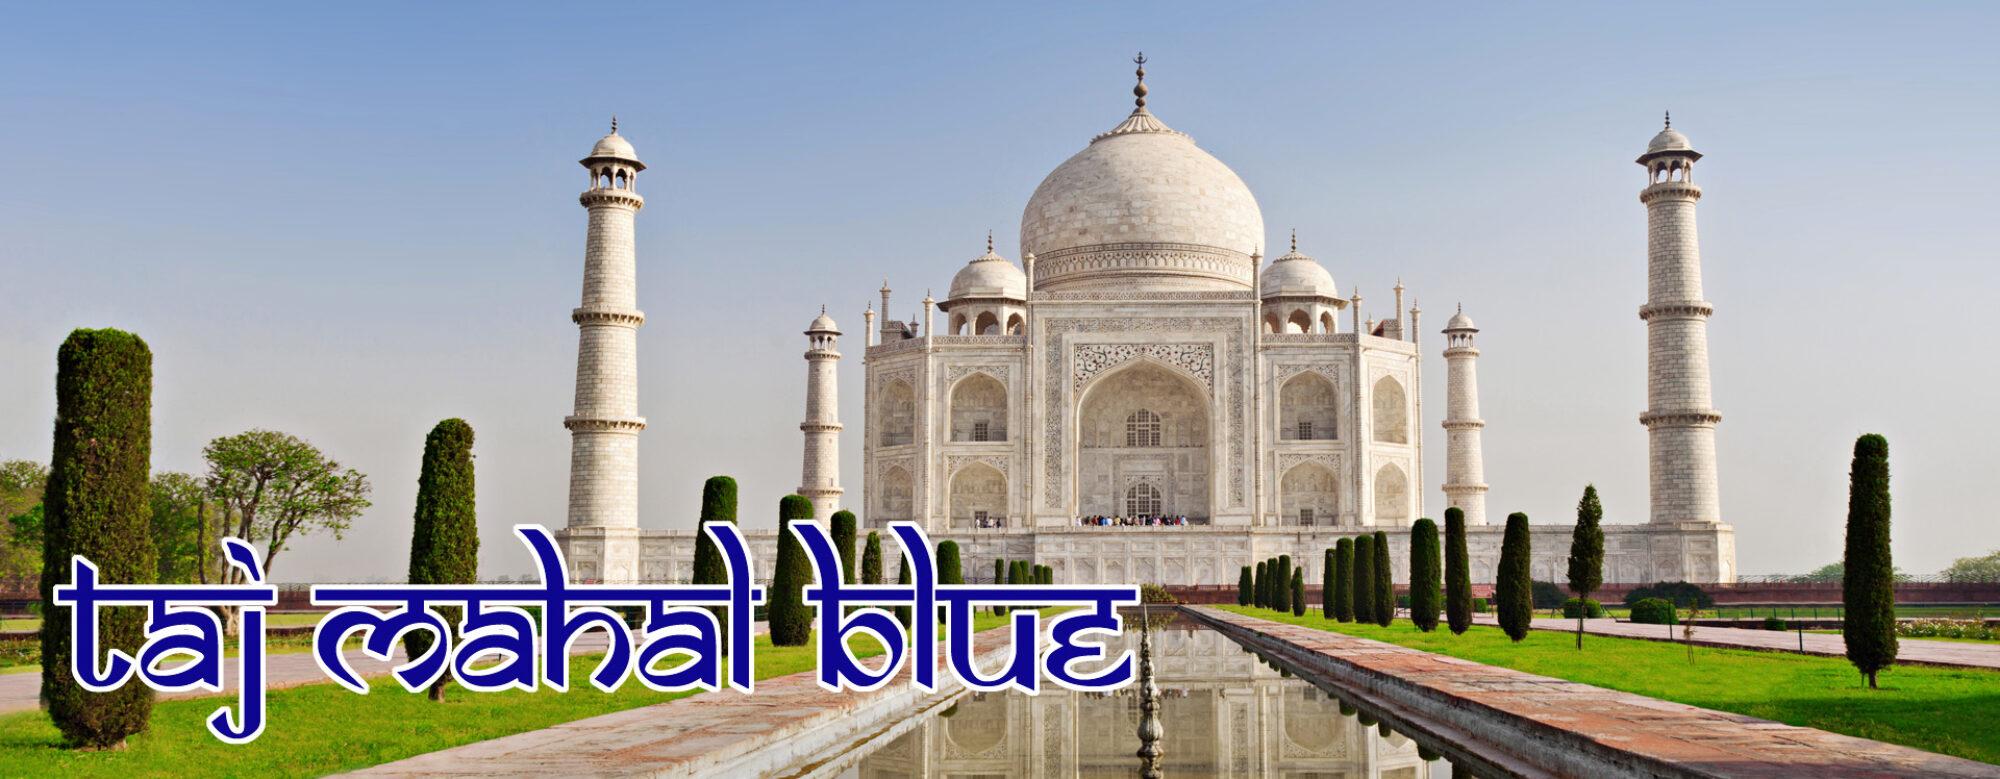 Taj Mahal Blue